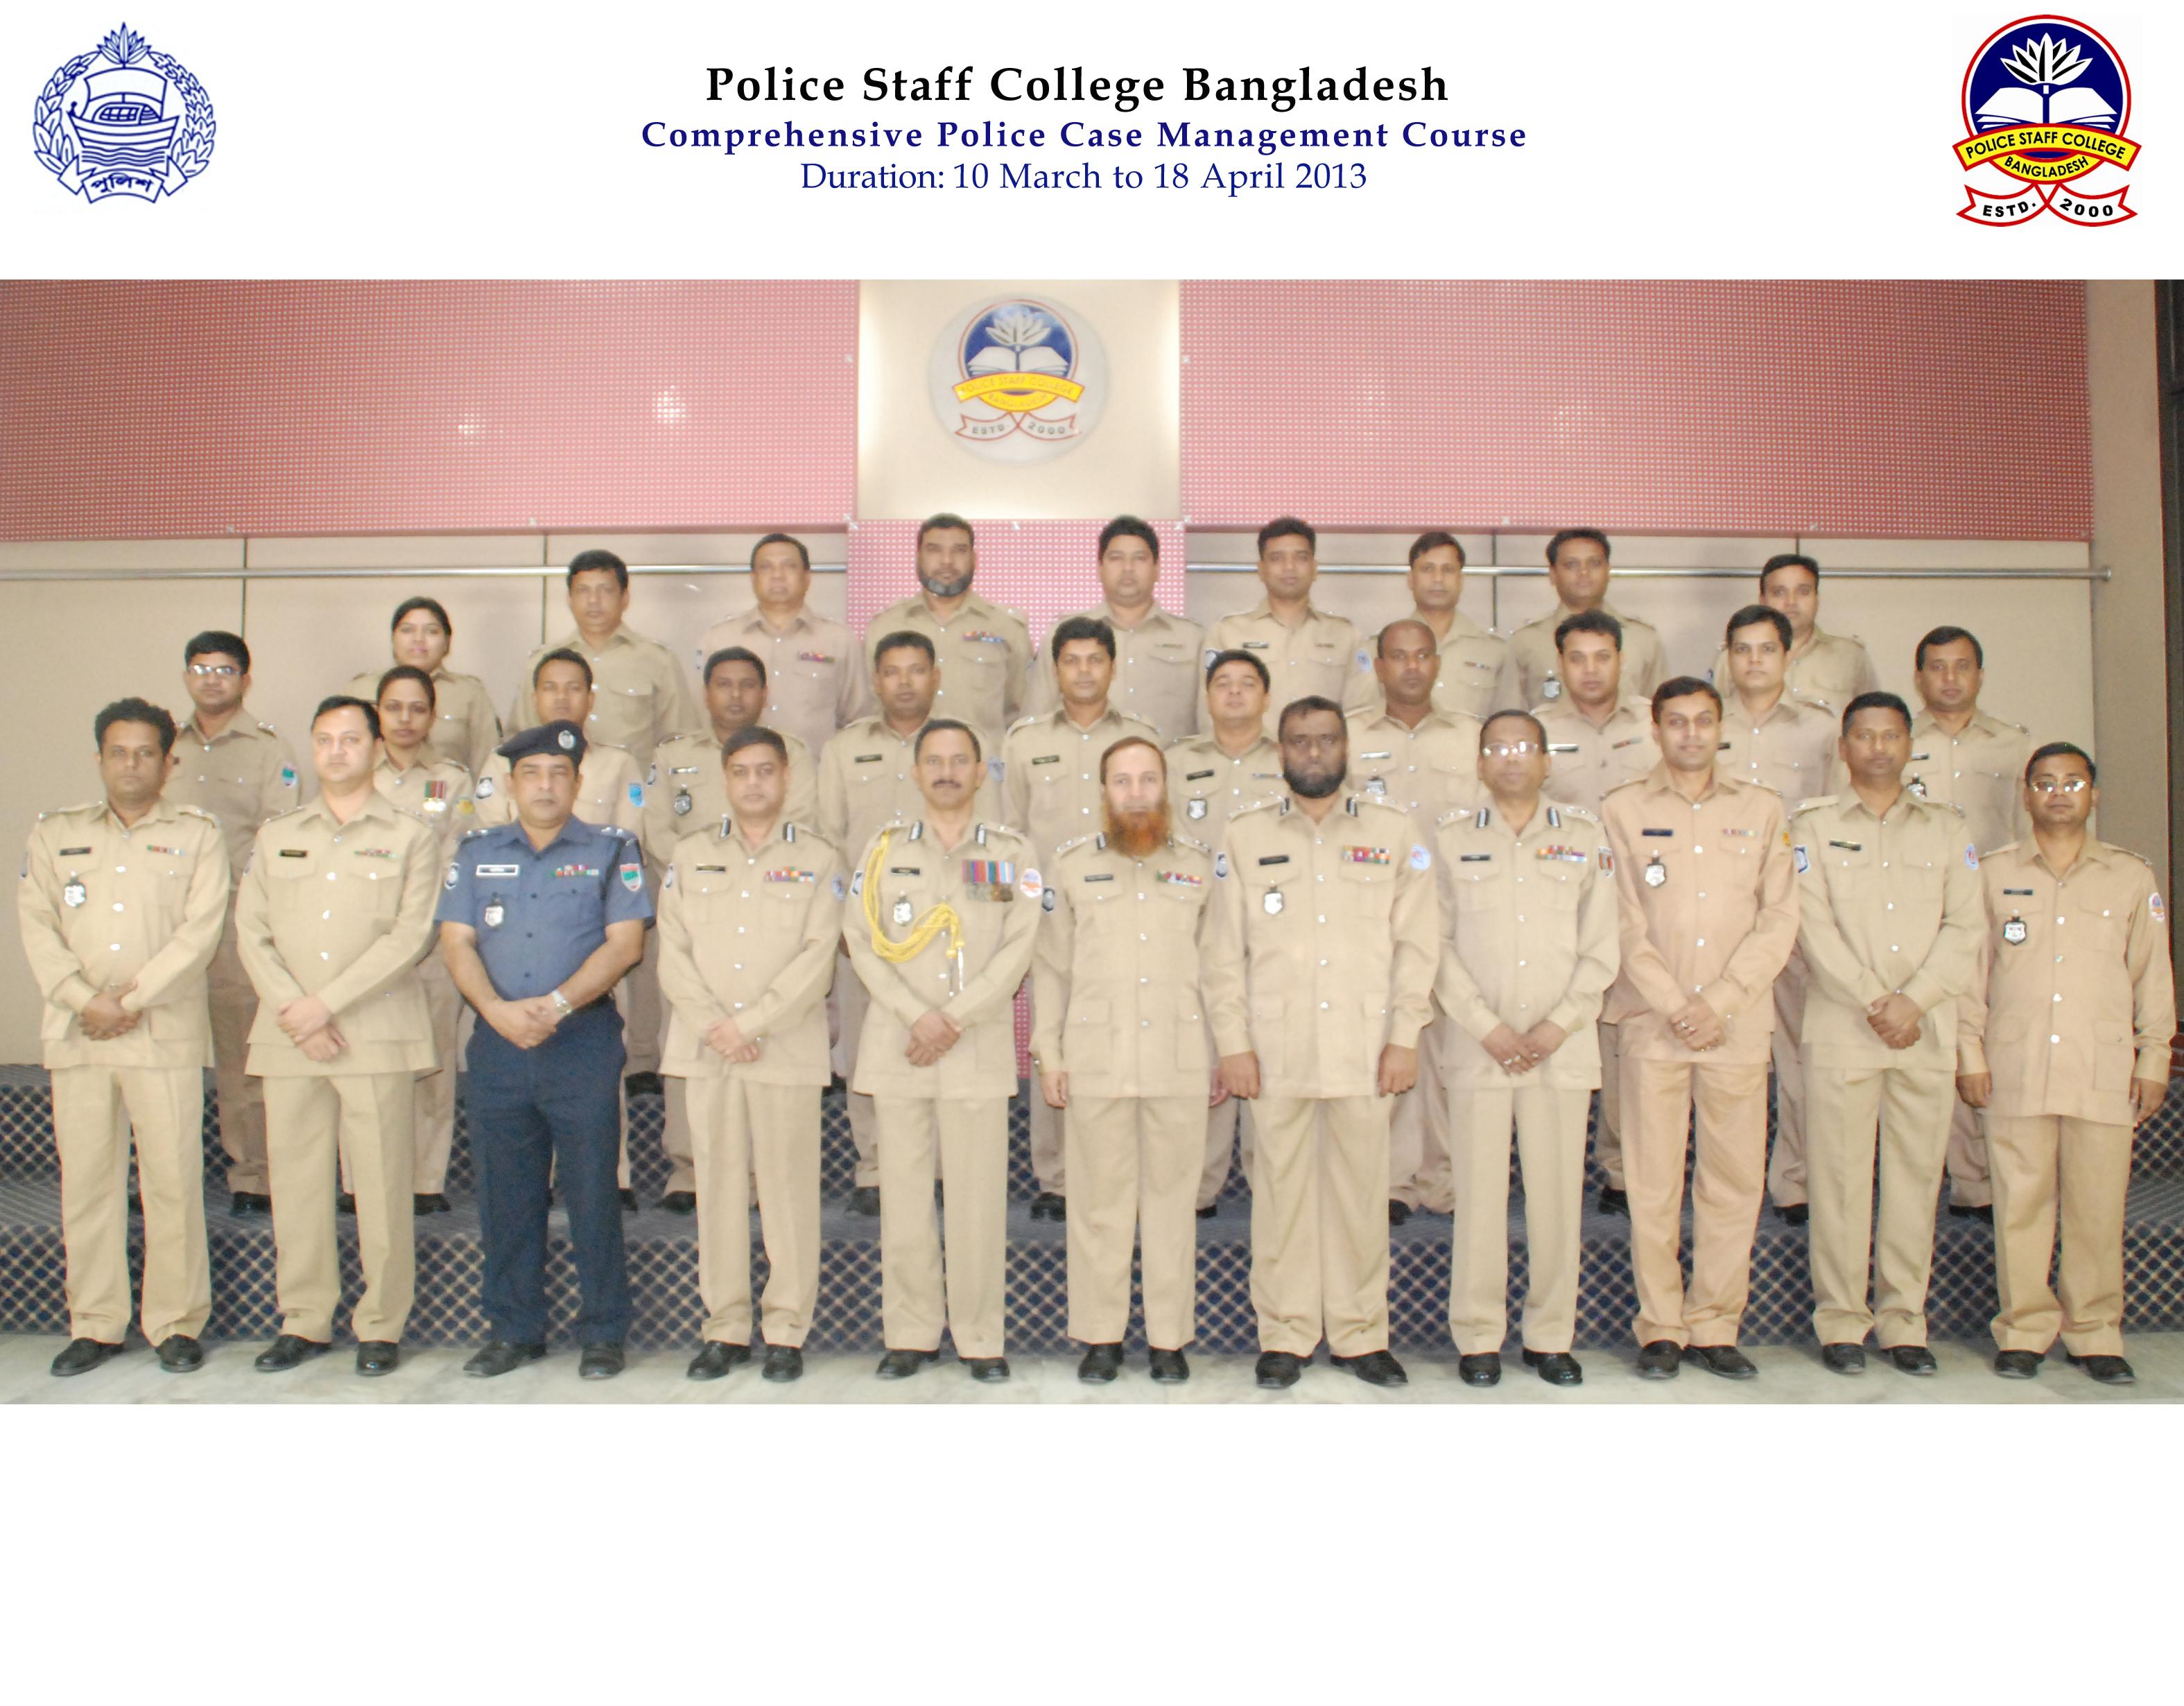 Participant of 1st Comprehensive Police Case Management Course